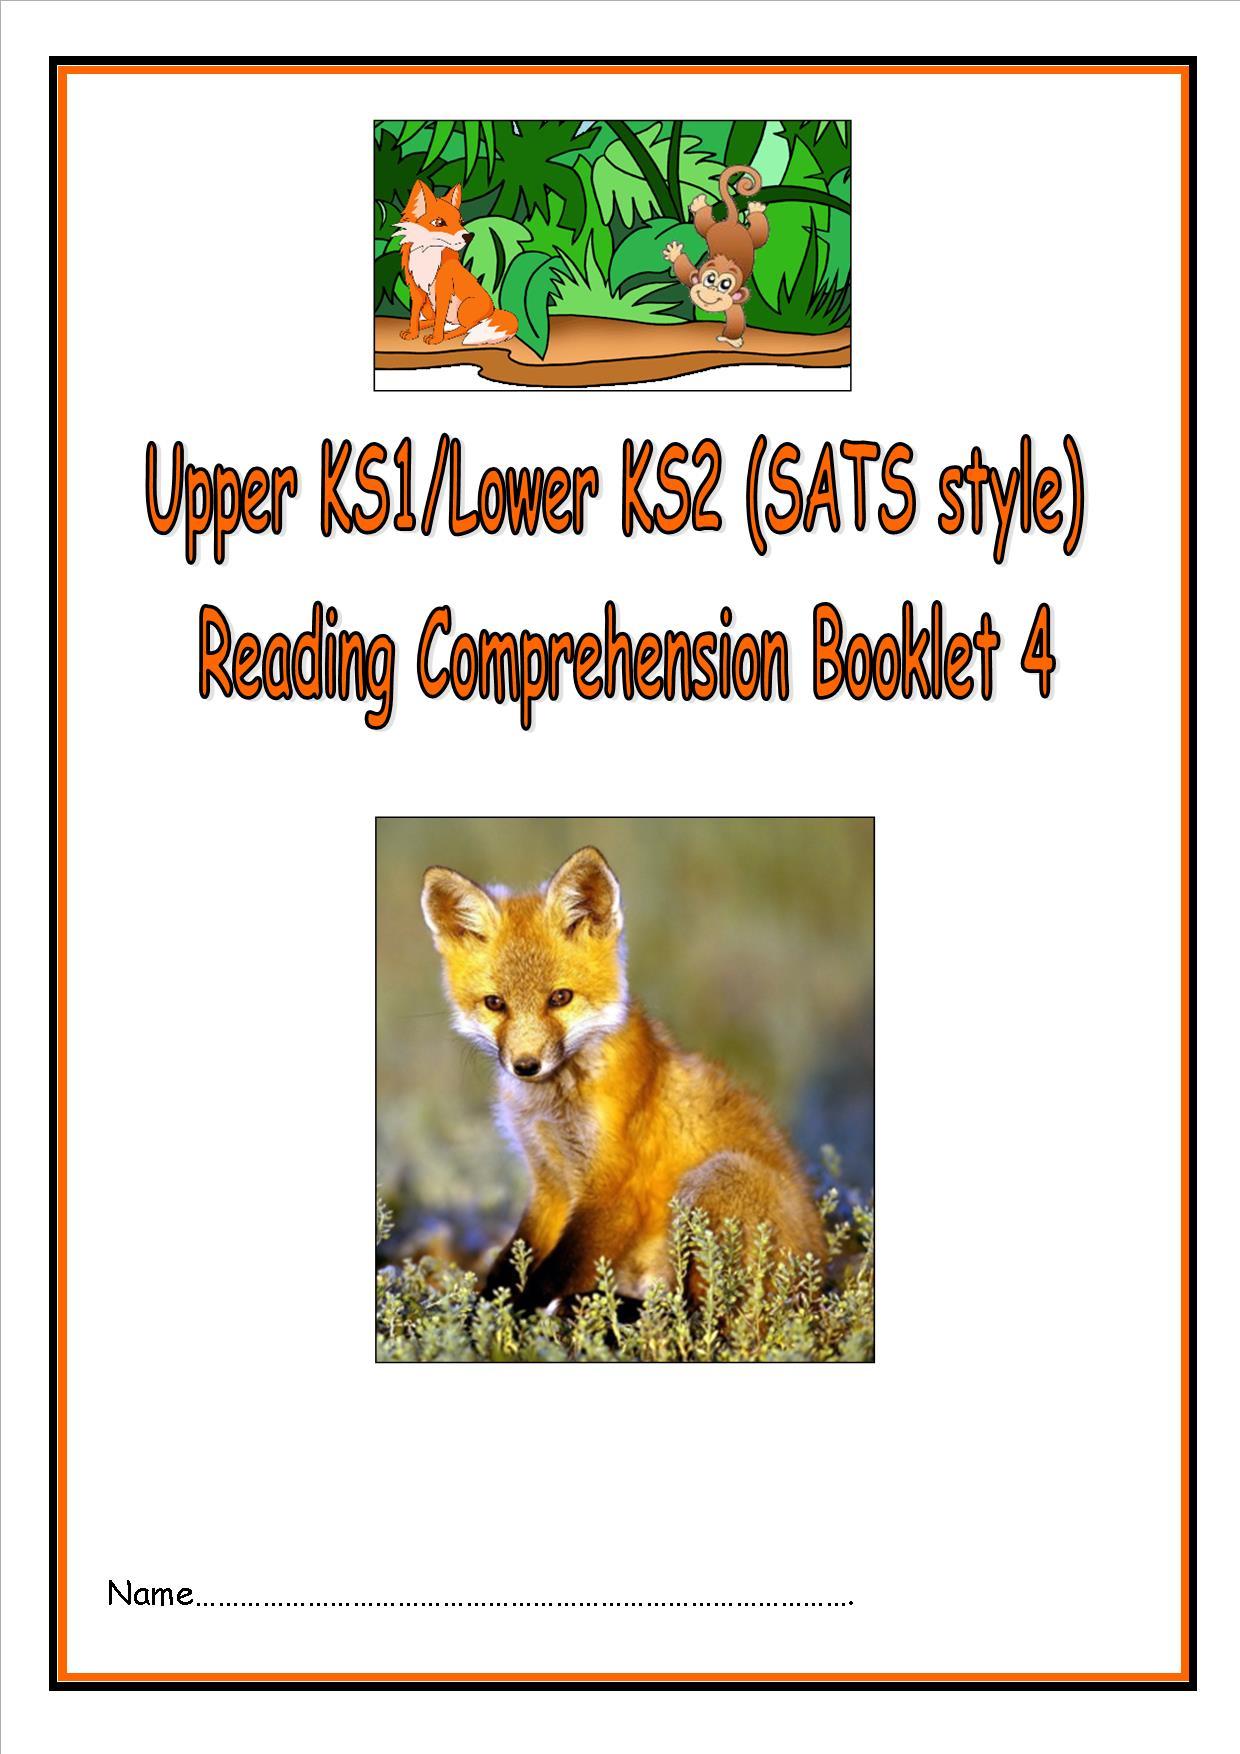 Worksheet Level 3 Comprehension reading comprehension ks1 level 3 owl babies prehension math worksheet ks2 literacy sats fiction non level